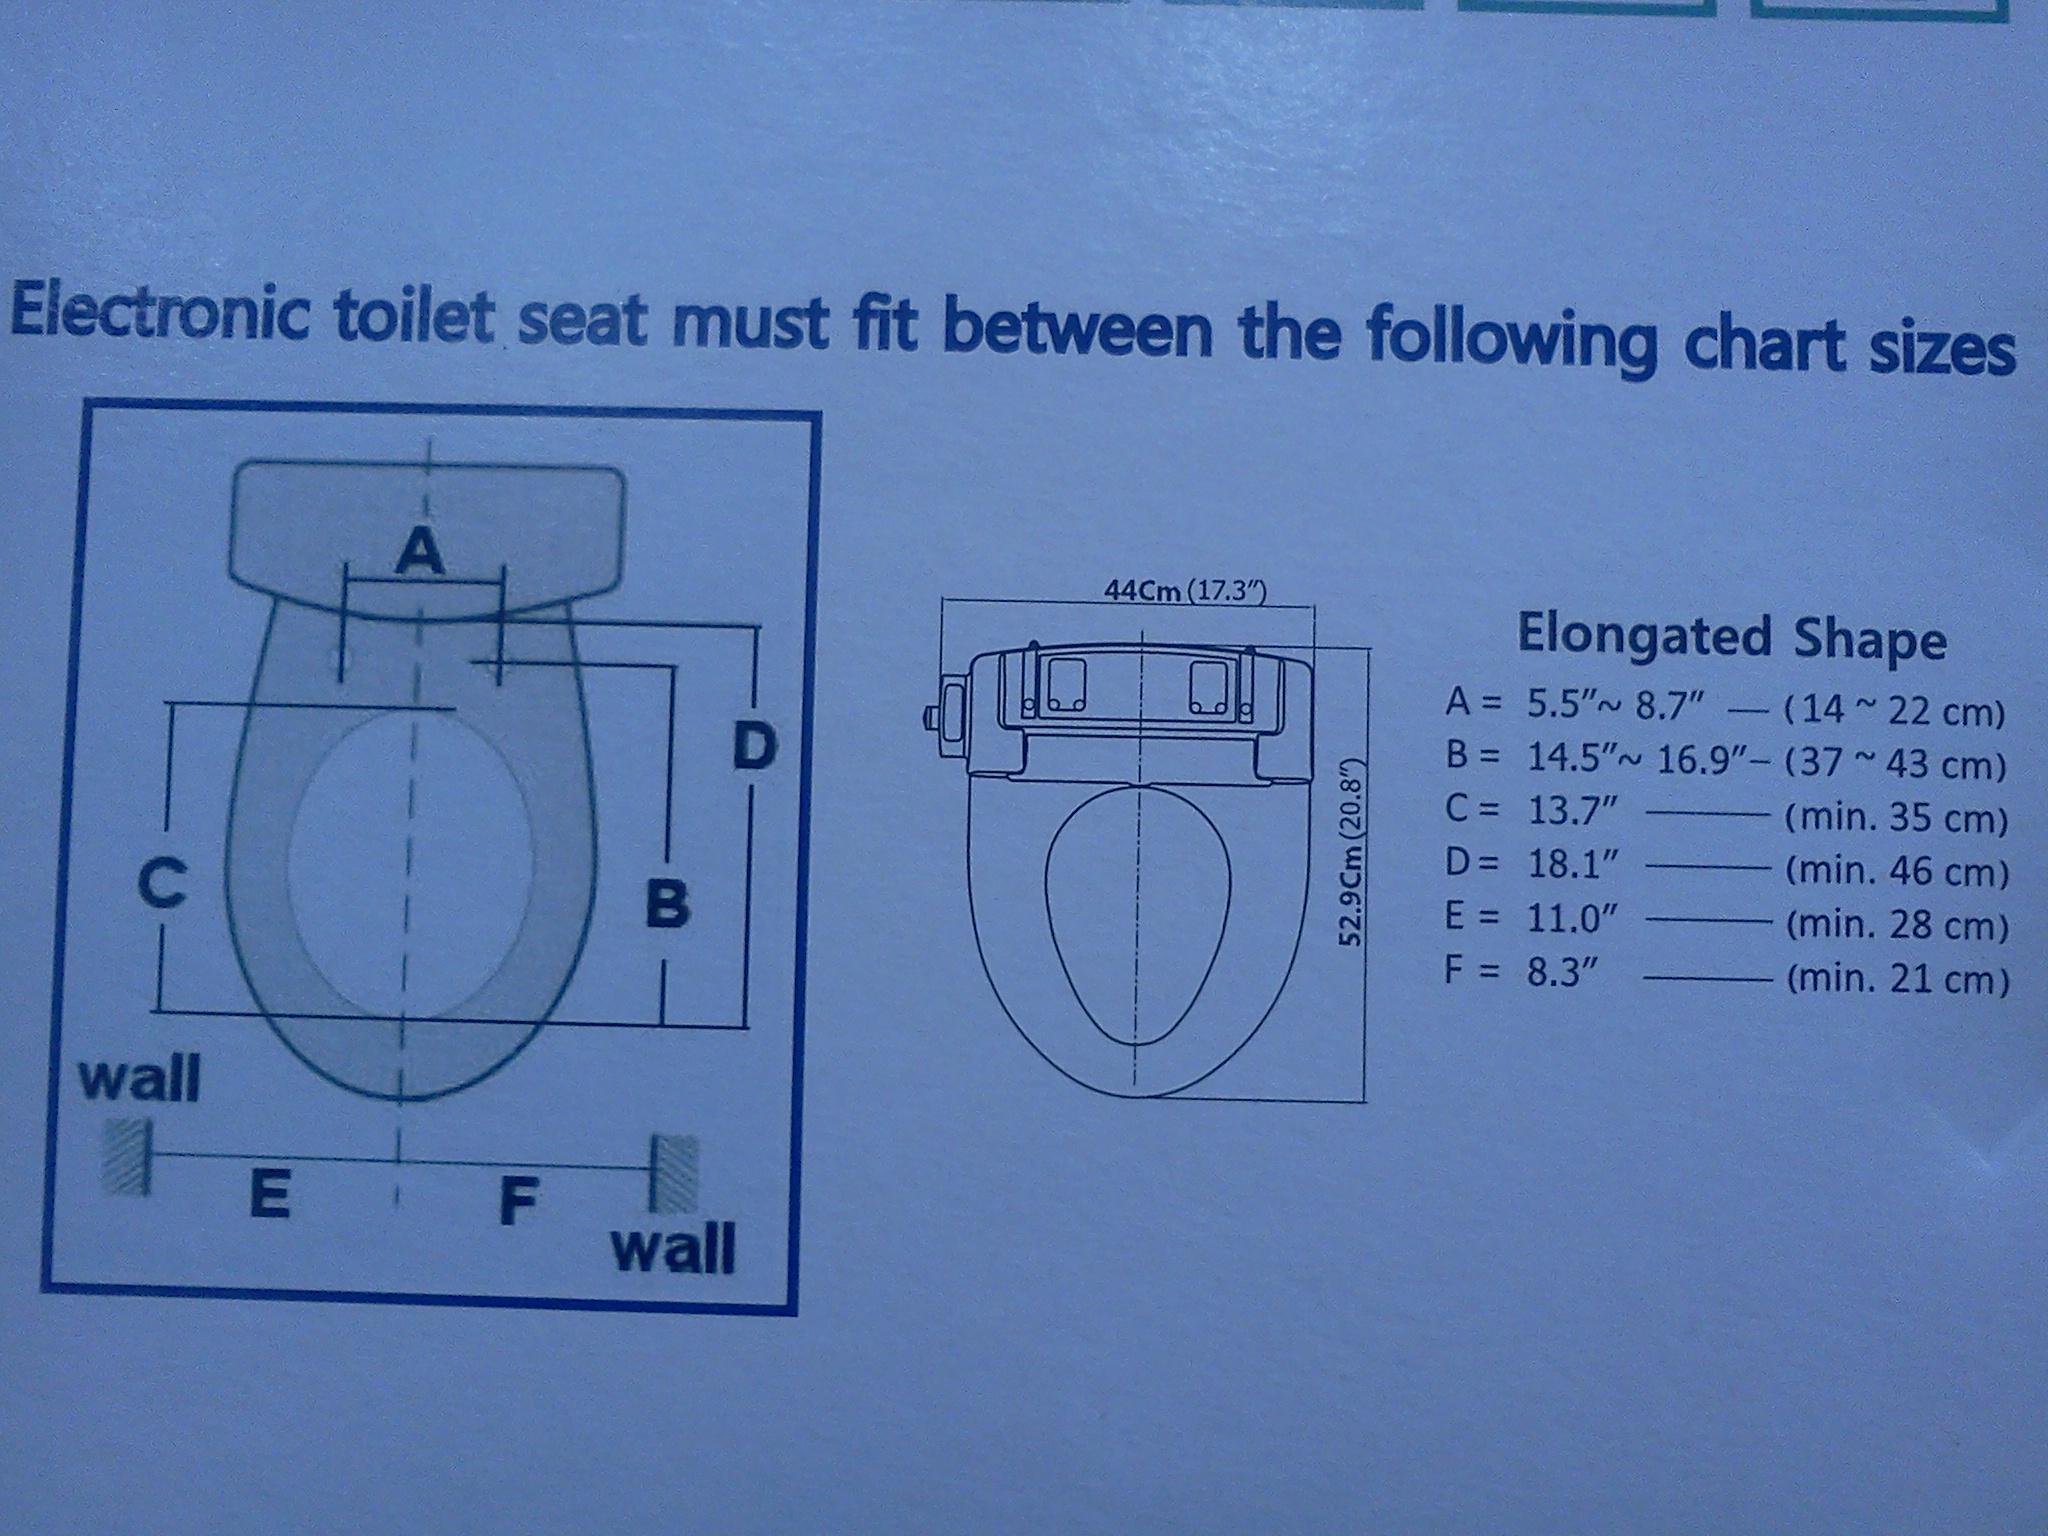 Amdm Intelliseat Bidet Toilet Seat 149 99 At Costco Updated With